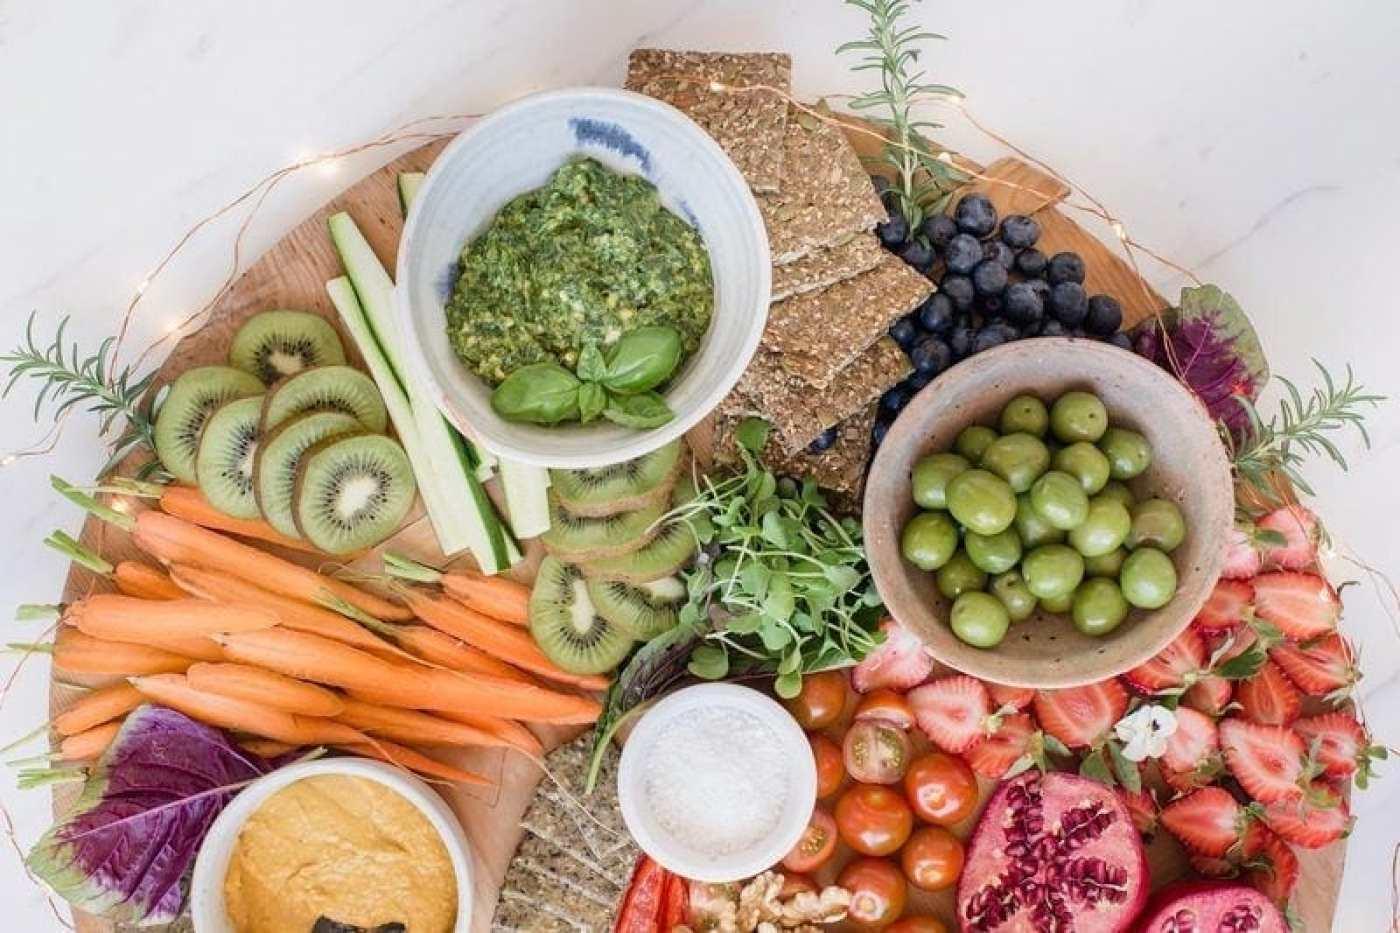 How to make a vegan platter